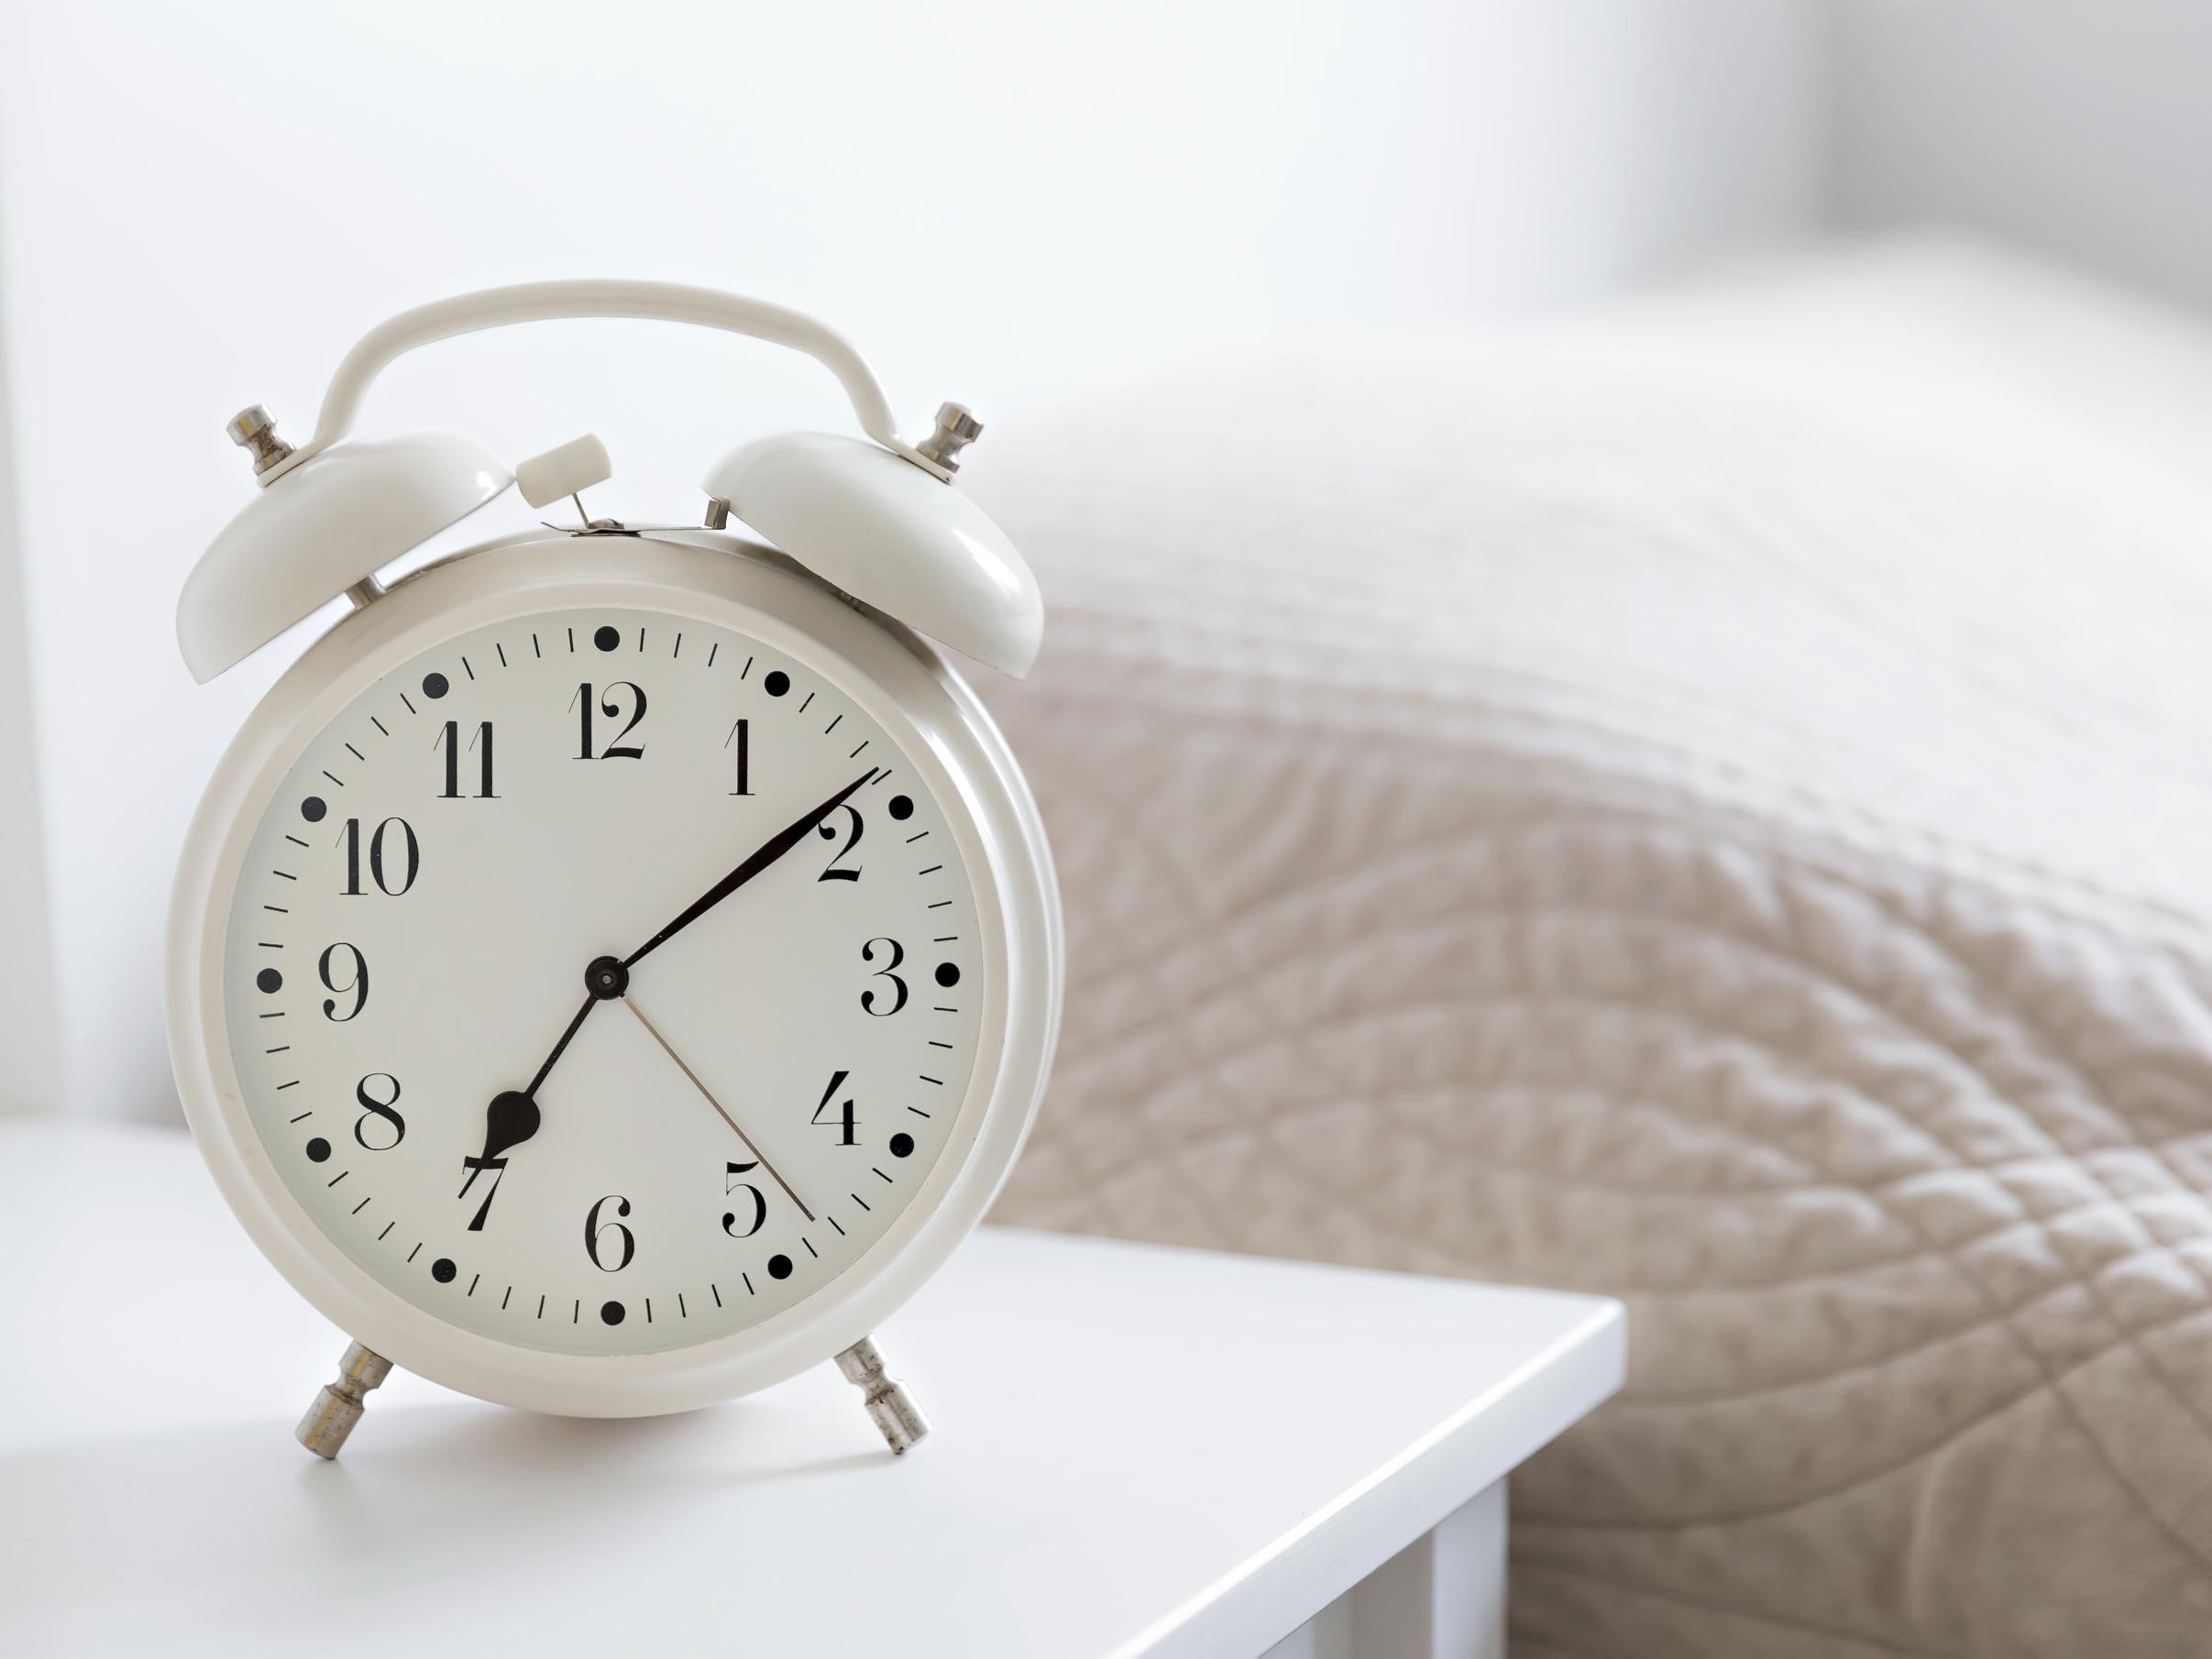 Clocks Go Back Quiz reversadermcreamcom : bedclock from reversadermcream.com size 2413 x 1810 jpeg 160kB